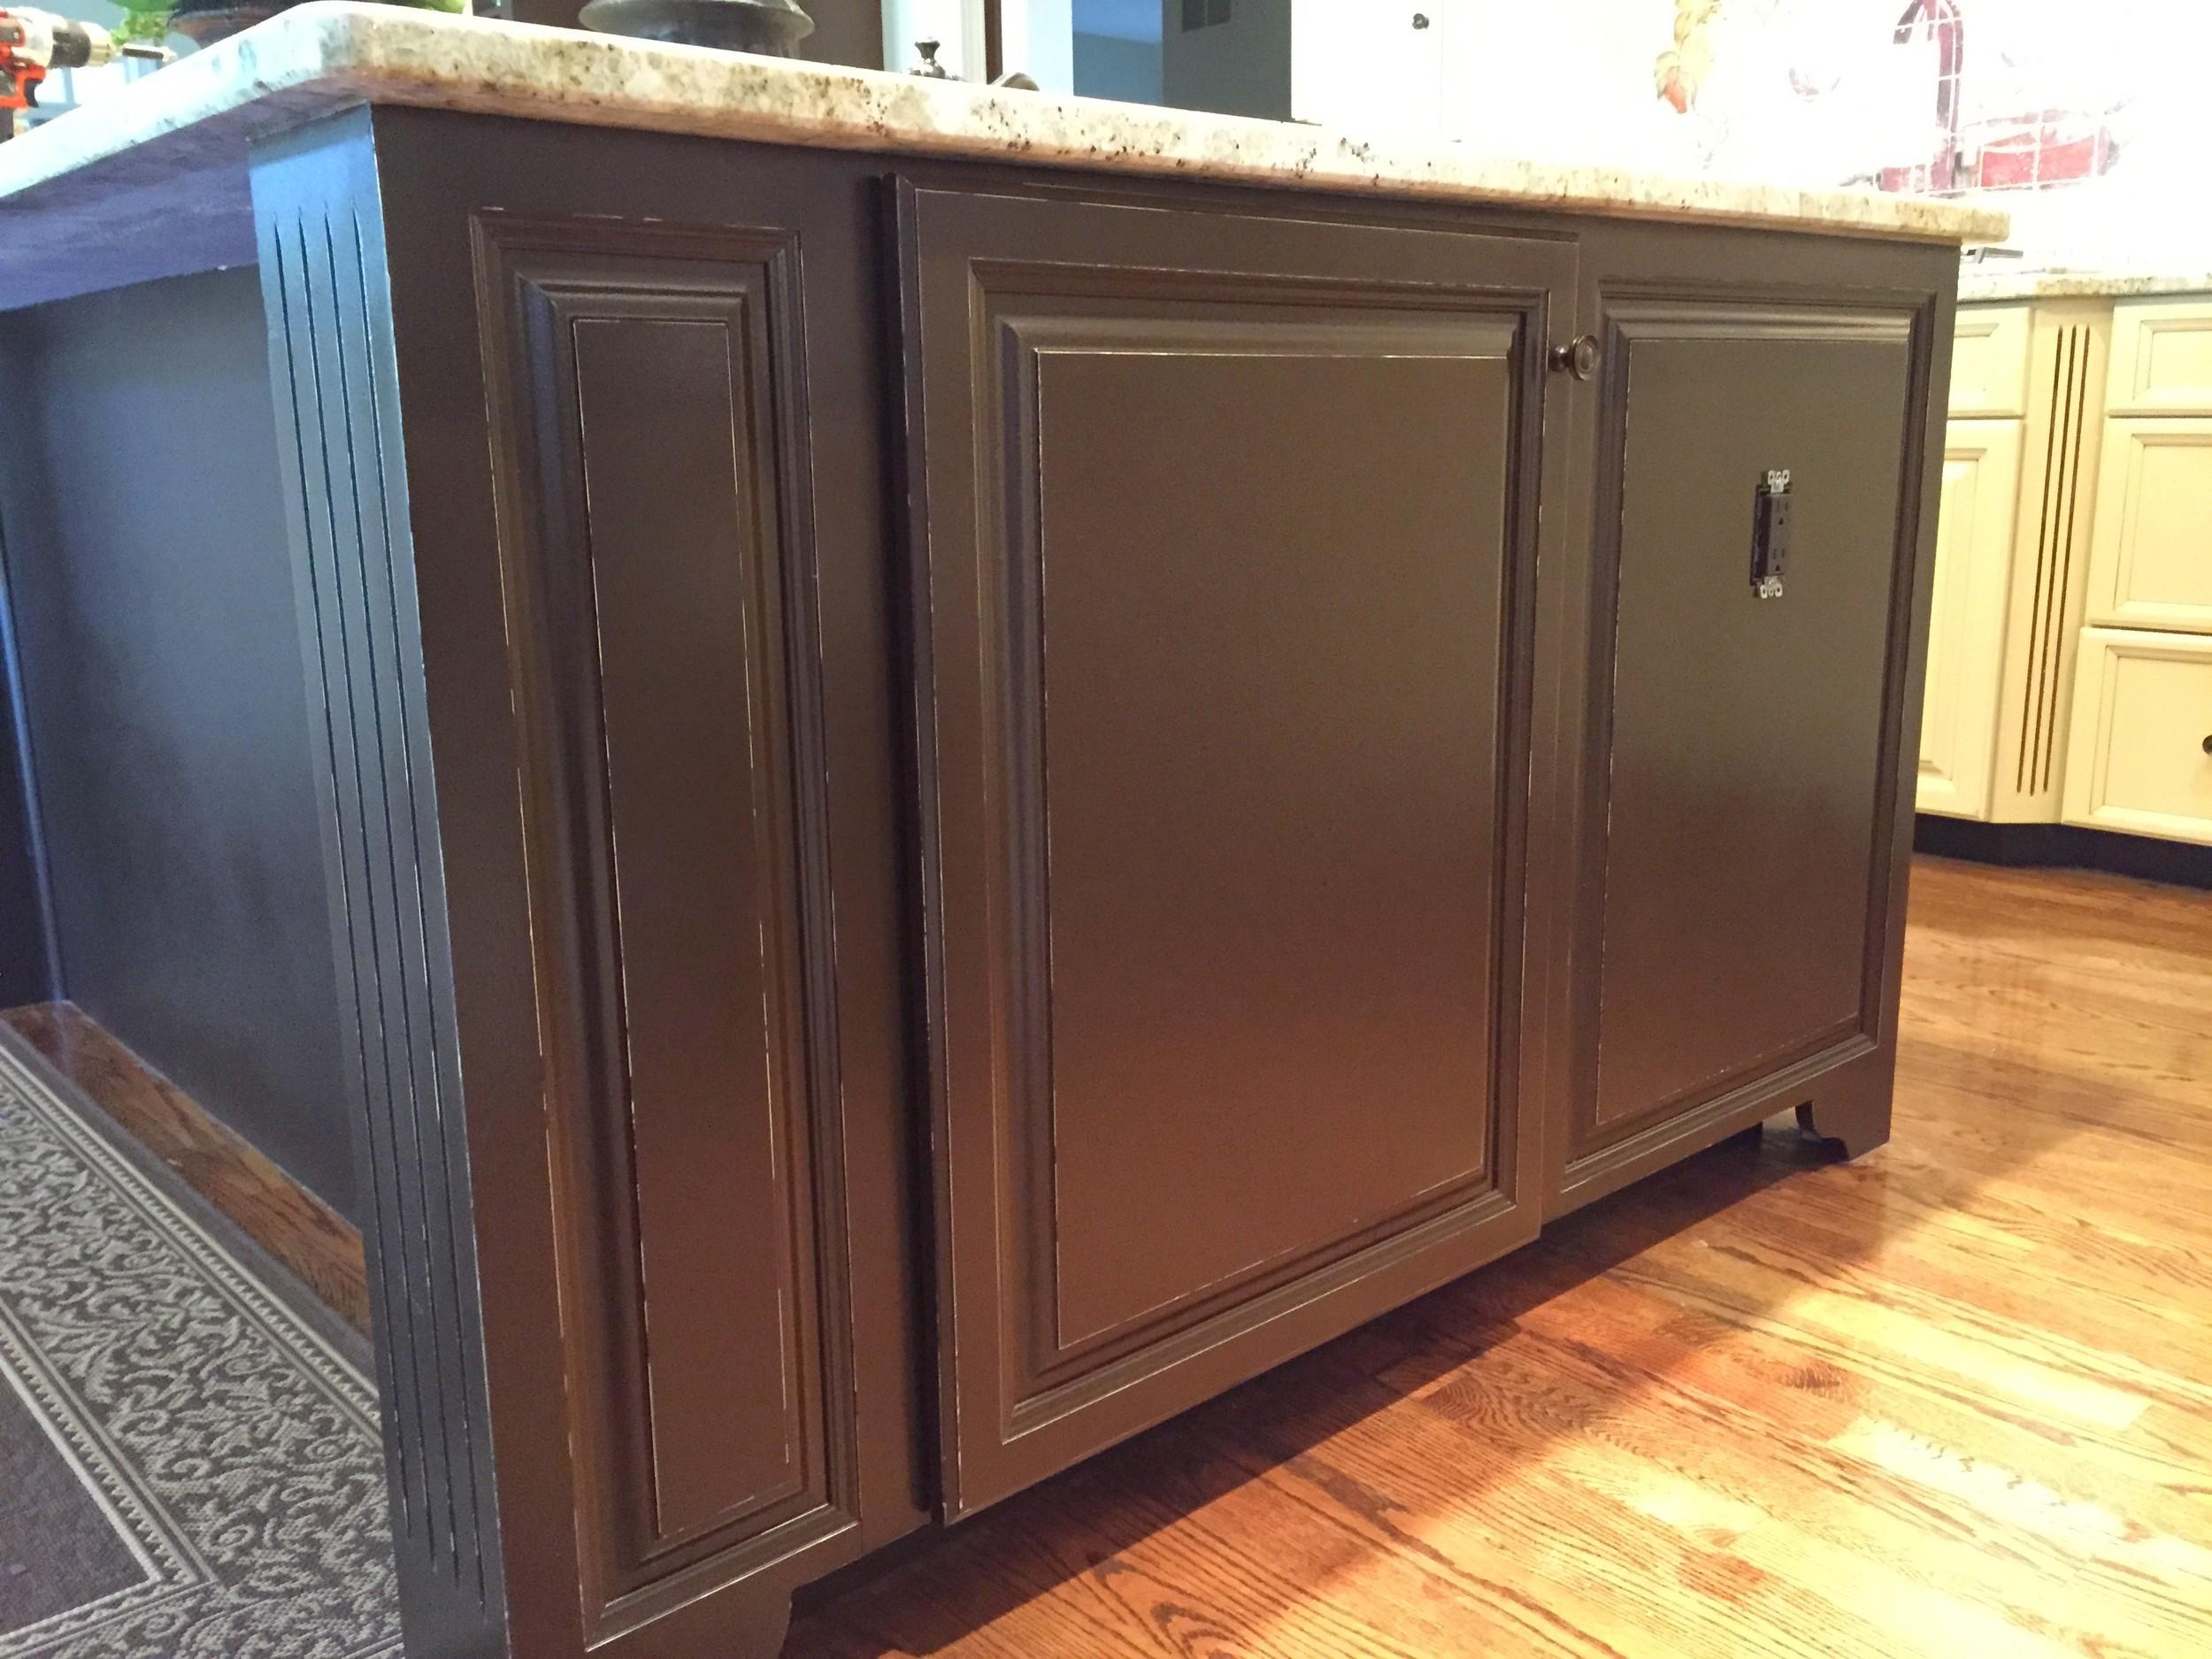 Kitchen Cabinet Painting Distressed Malvern, PA